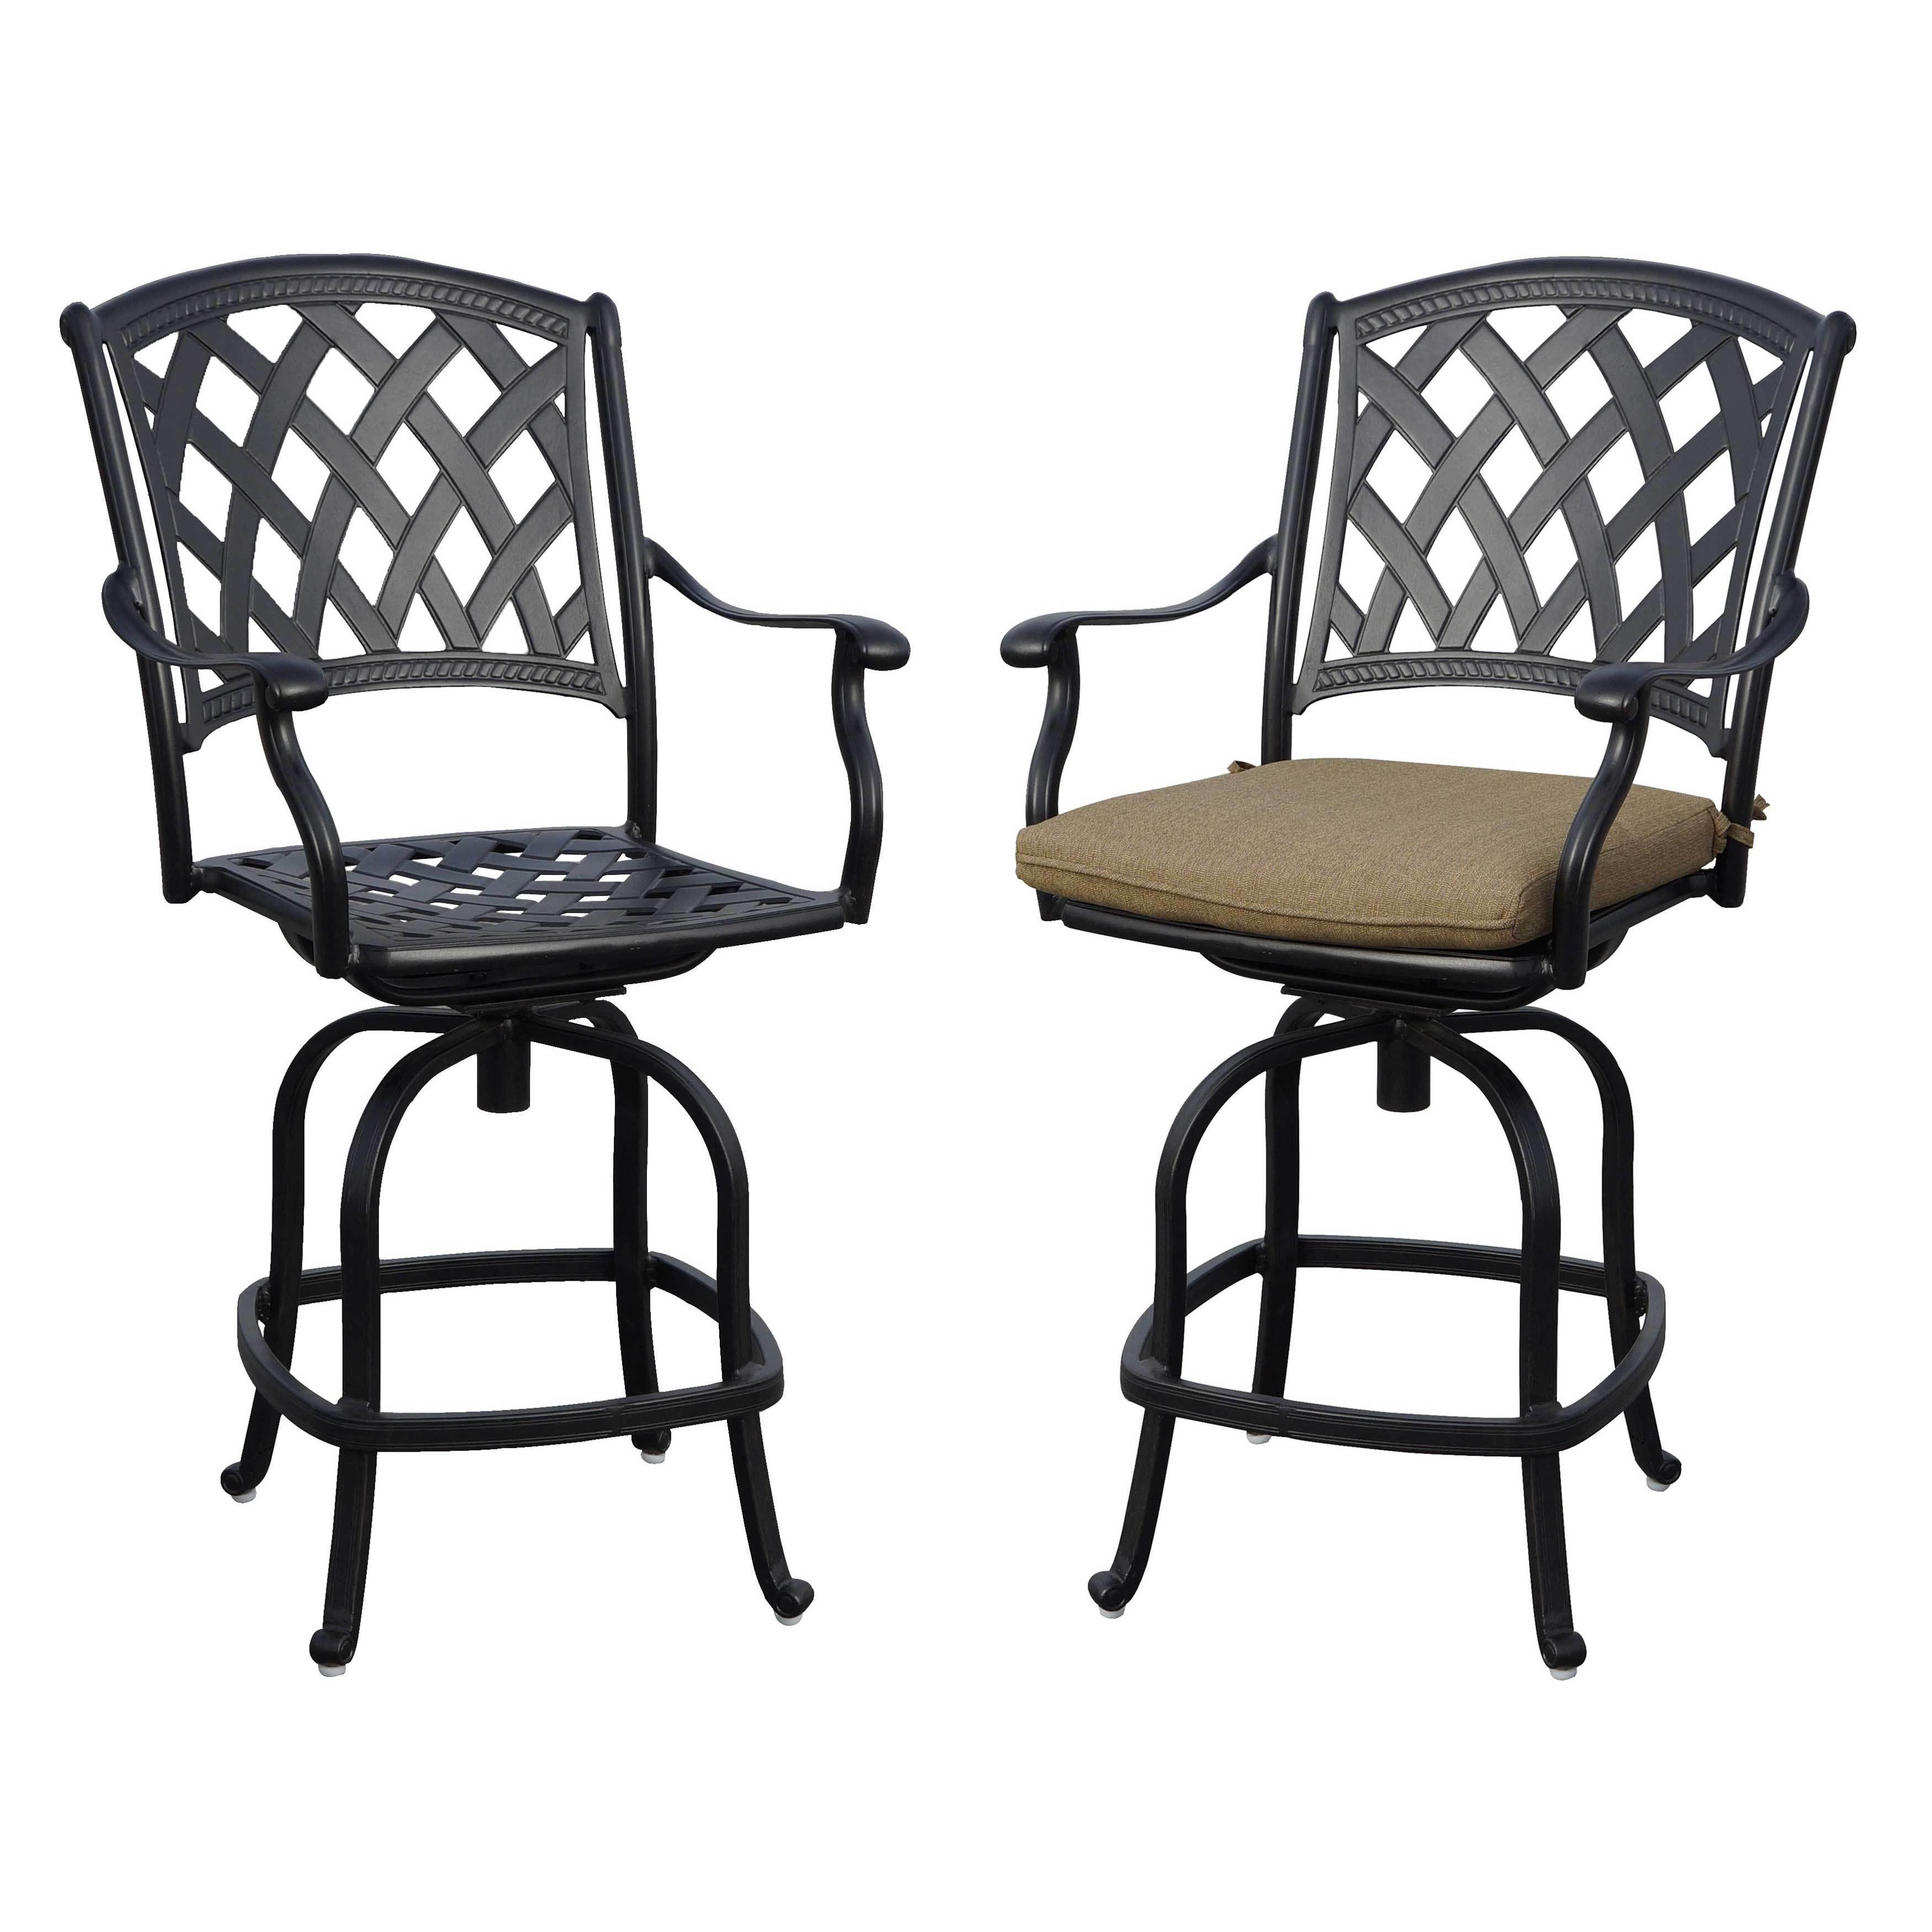 Pleasant Ocean View Black Powder Coated Aluminum Counter Height Swivel Bar Stools With Seat Cushions Antique Bronze Spiritservingveterans Wood Chair Design Ideas Spiritservingveteransorg